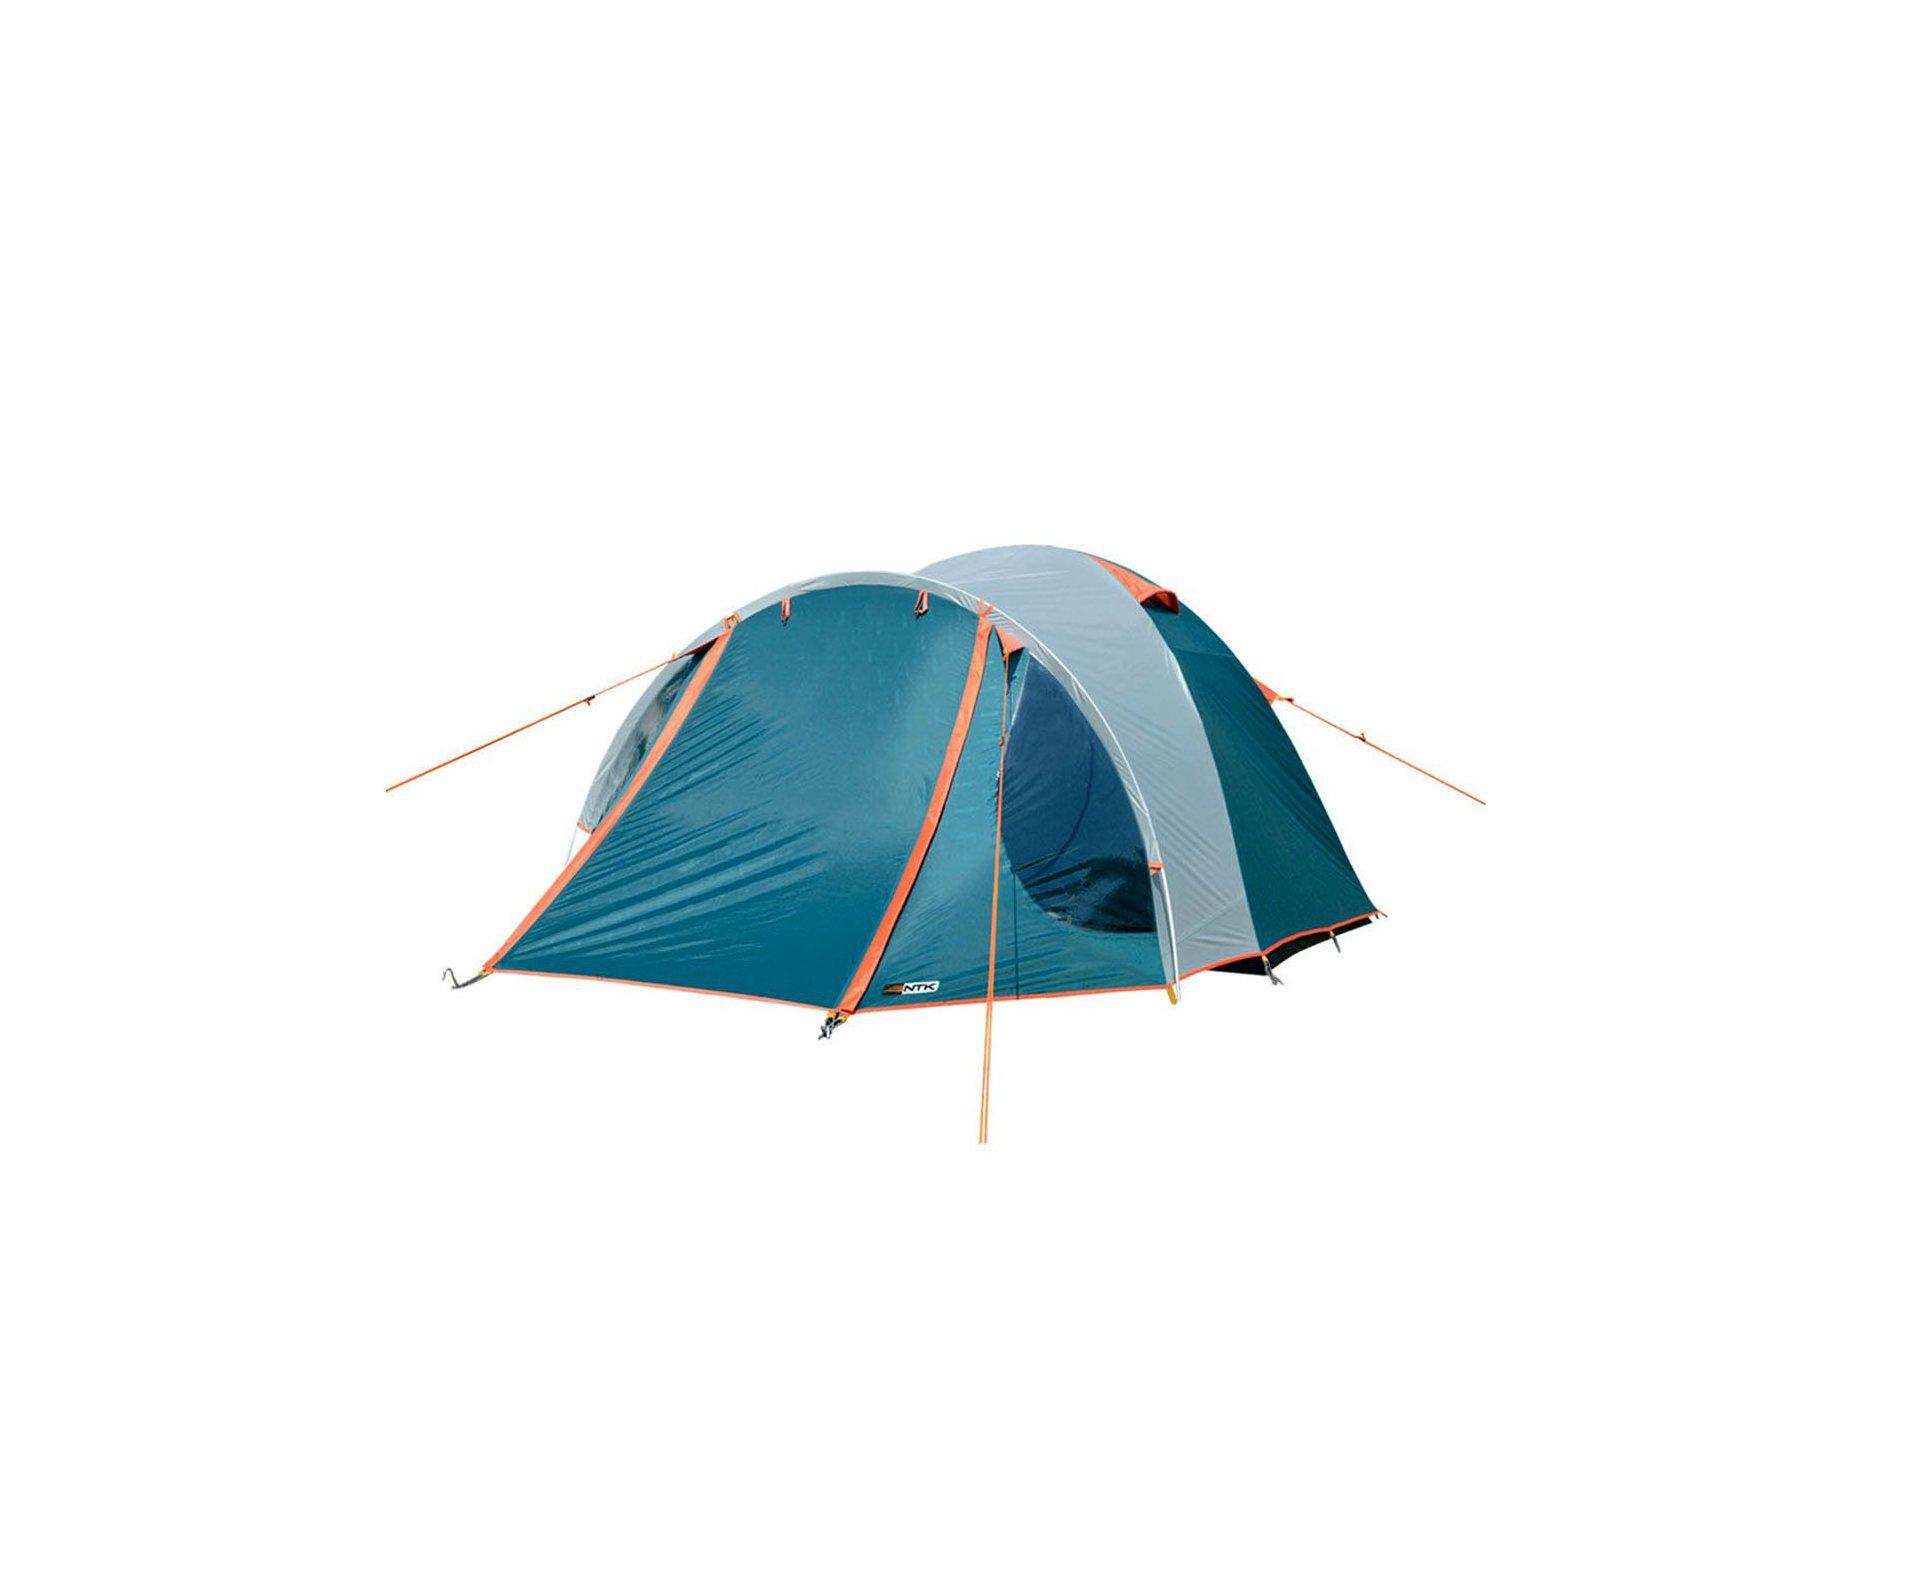 Barraca Iglu Indy Gt Para Camping 2/3 Pessoas Nautika